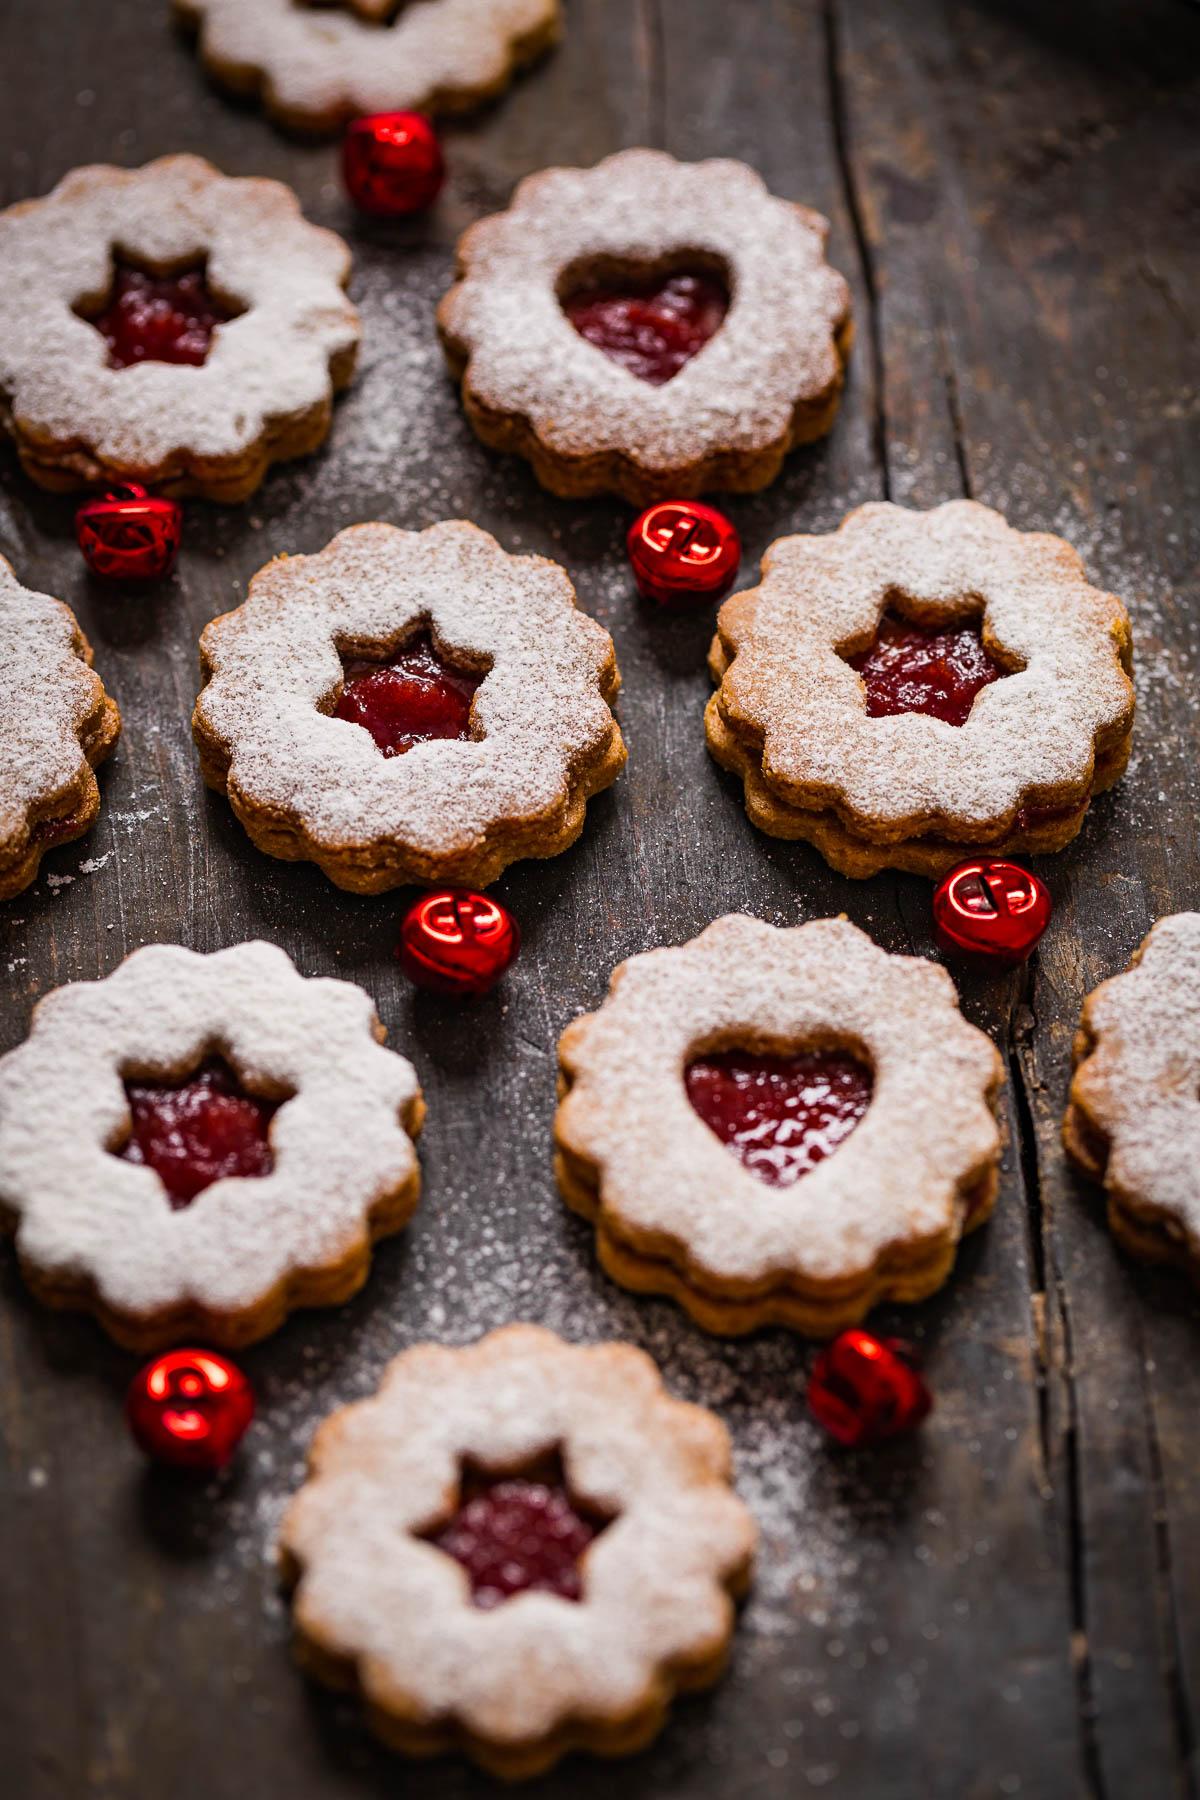 ricetta originale BISCOTTI LINZER VEGANI senza burro senza uova biscotti di Natale -VEGAN LINZER COOKIES recipe Christmas cookies